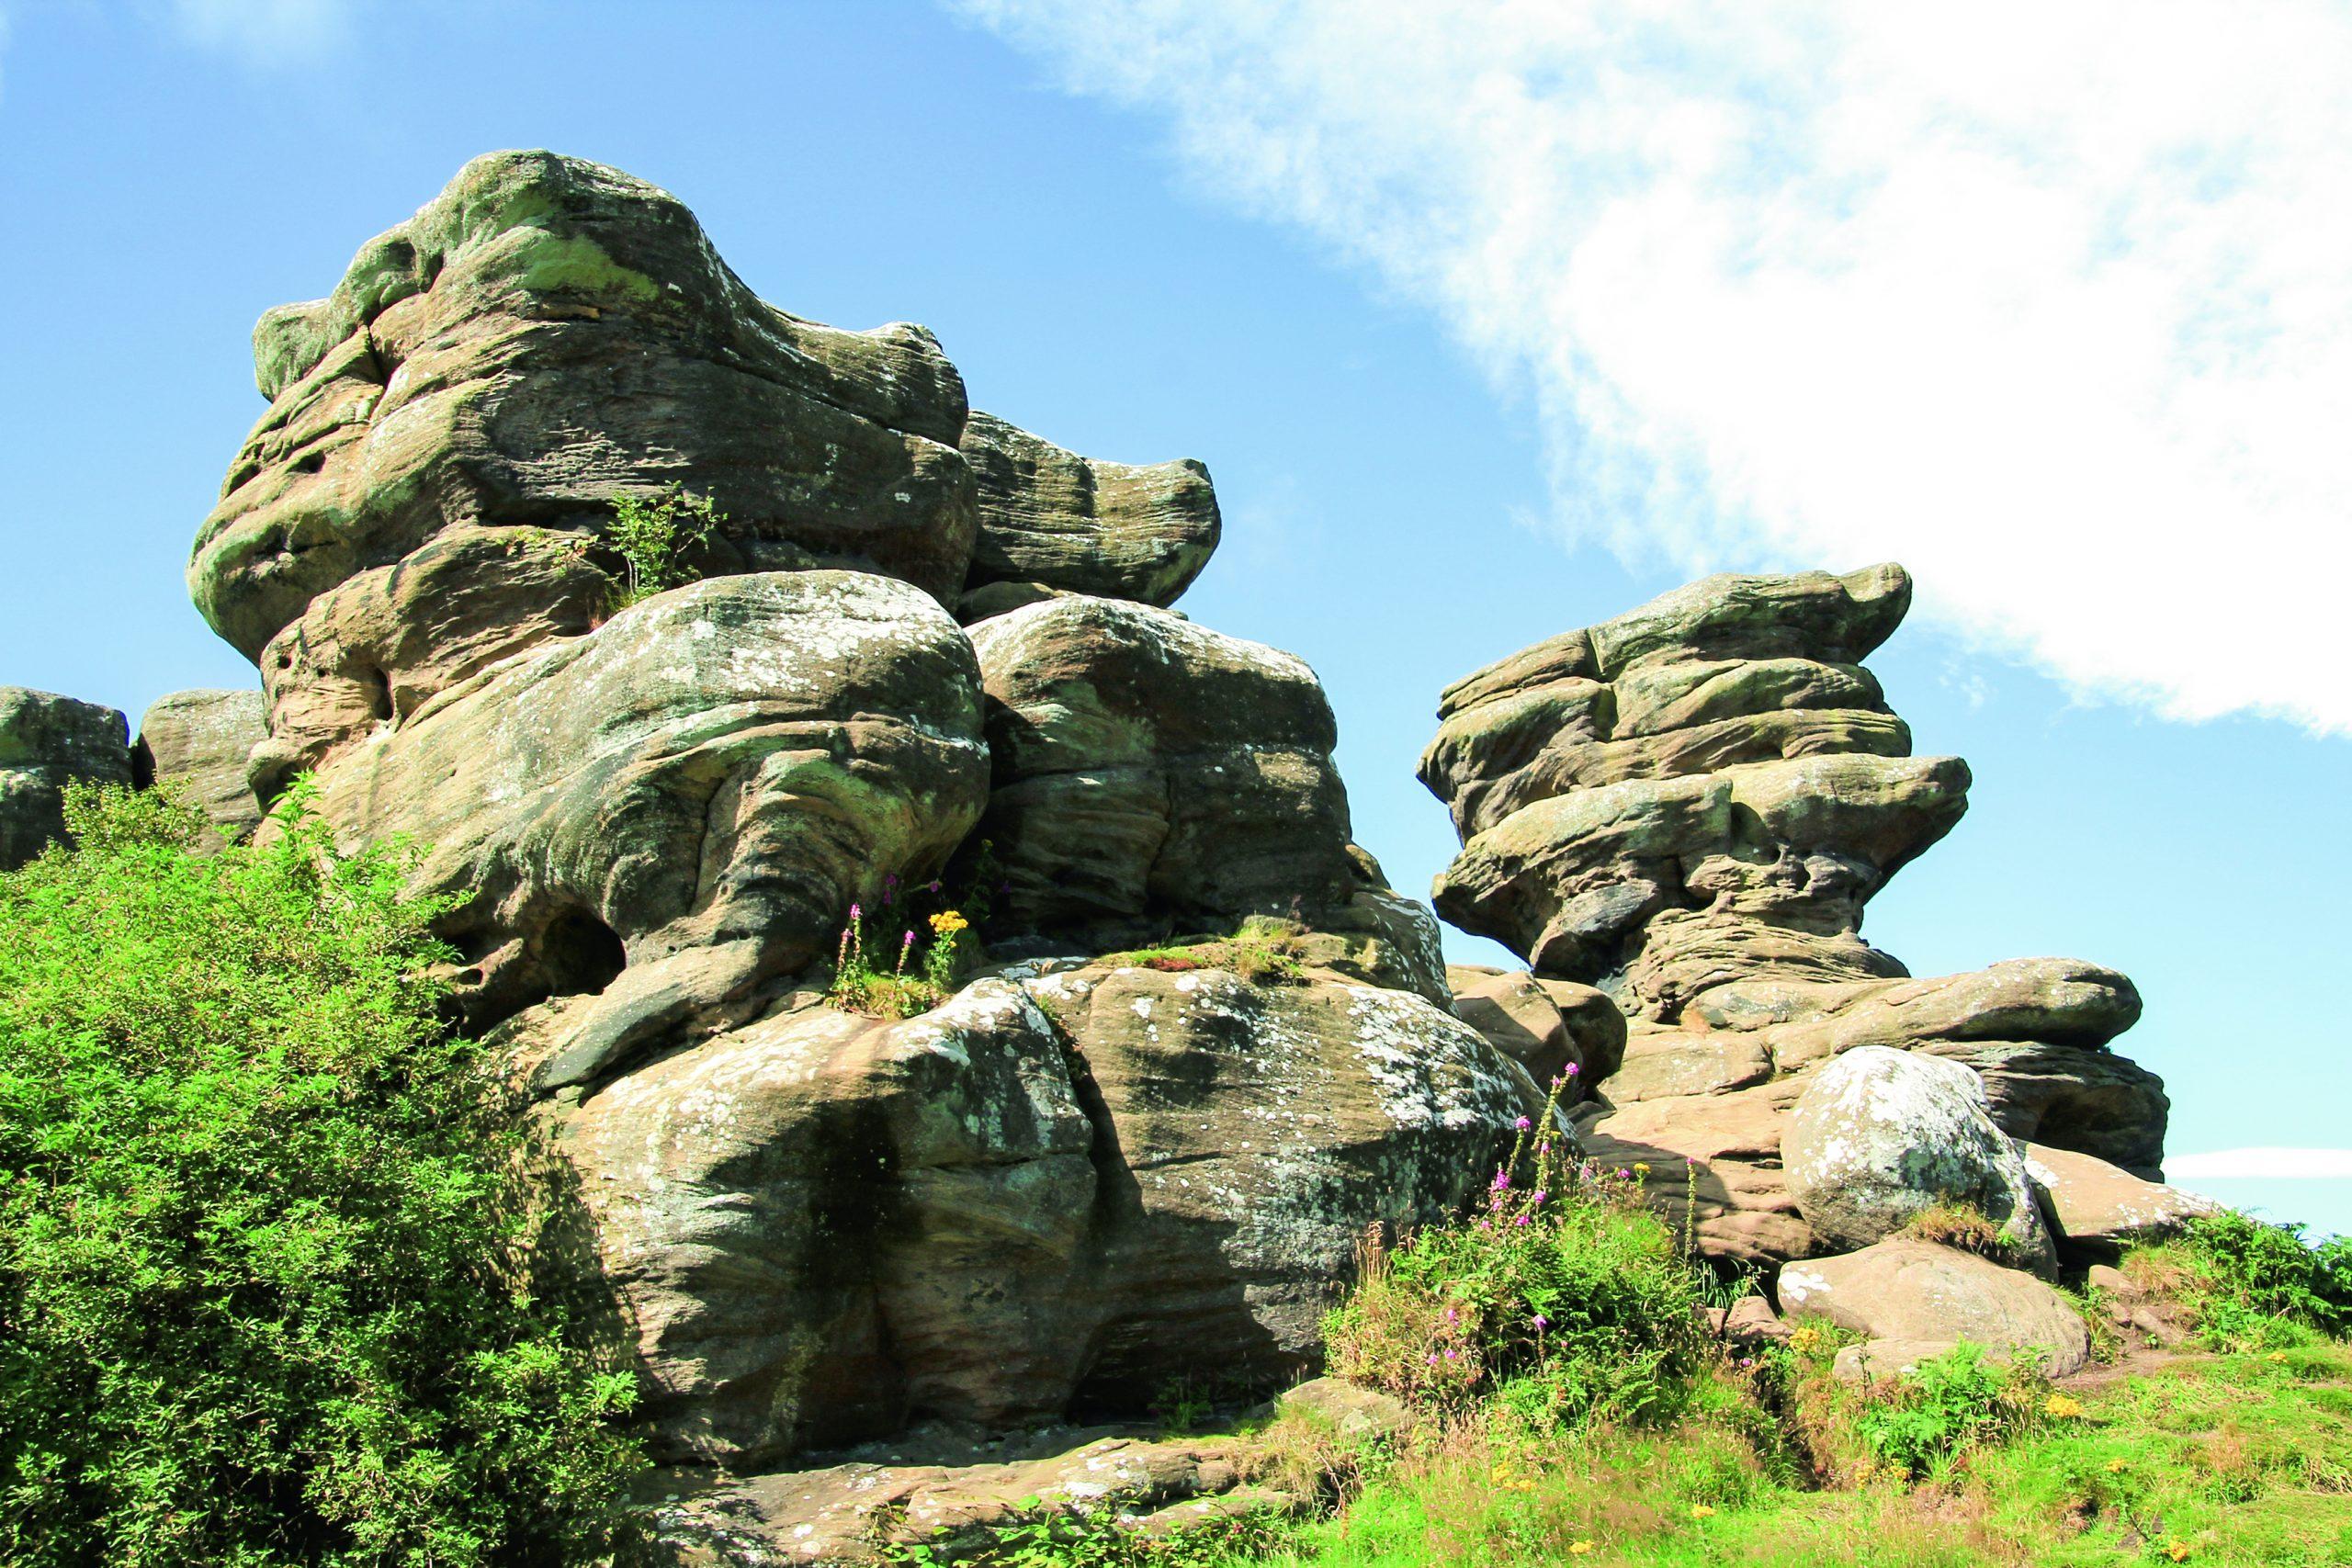 A Visit to Brimham Rocks, North Yorkshire